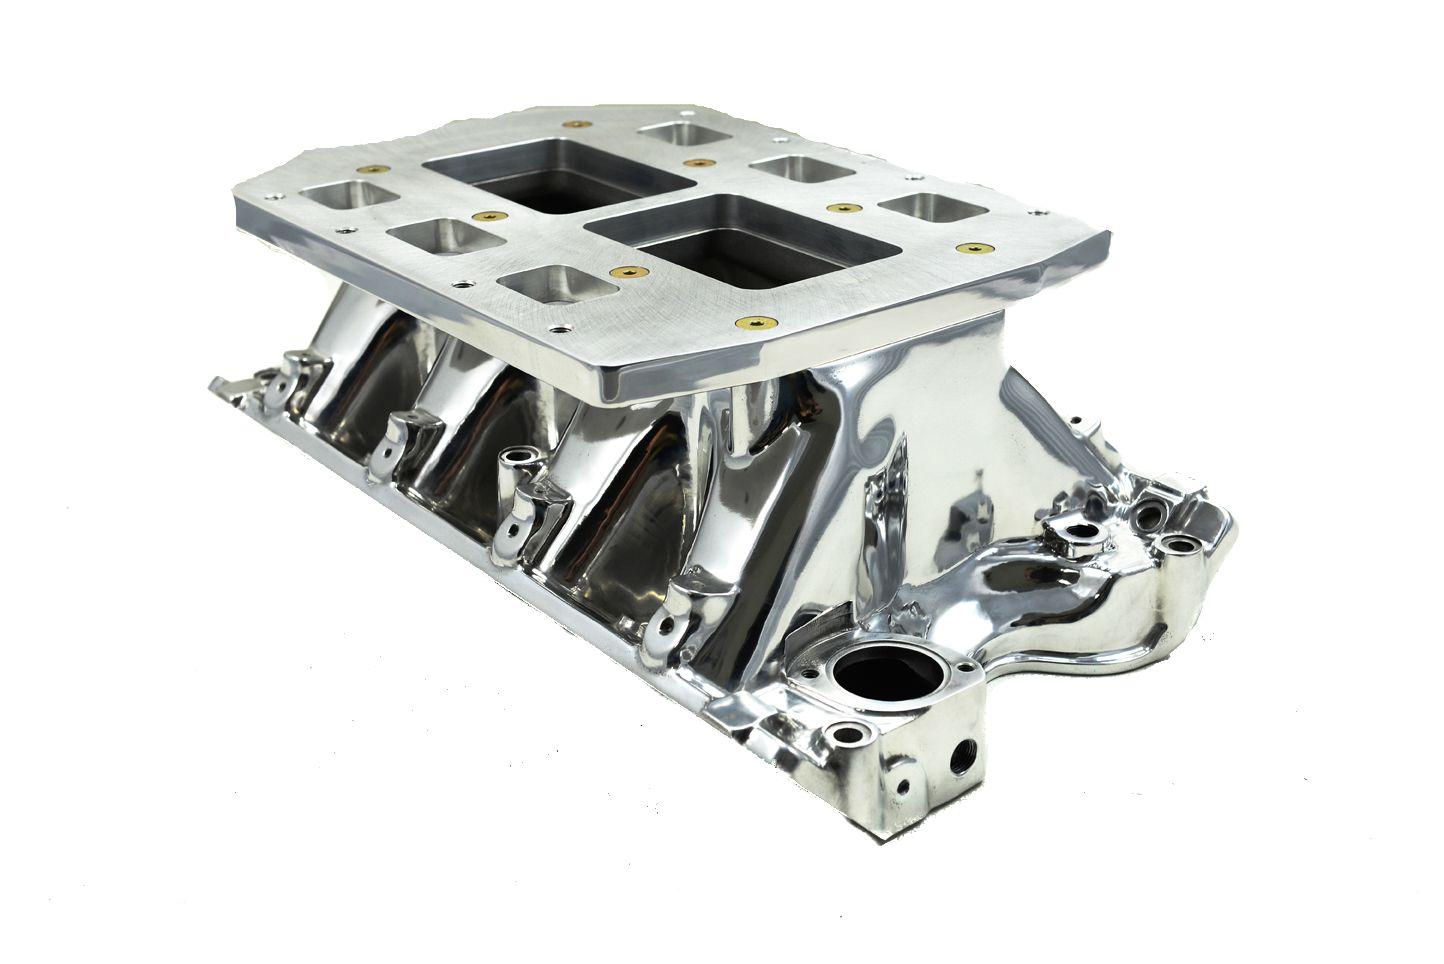 Ford 460 Blower Manifold [#FRD460]